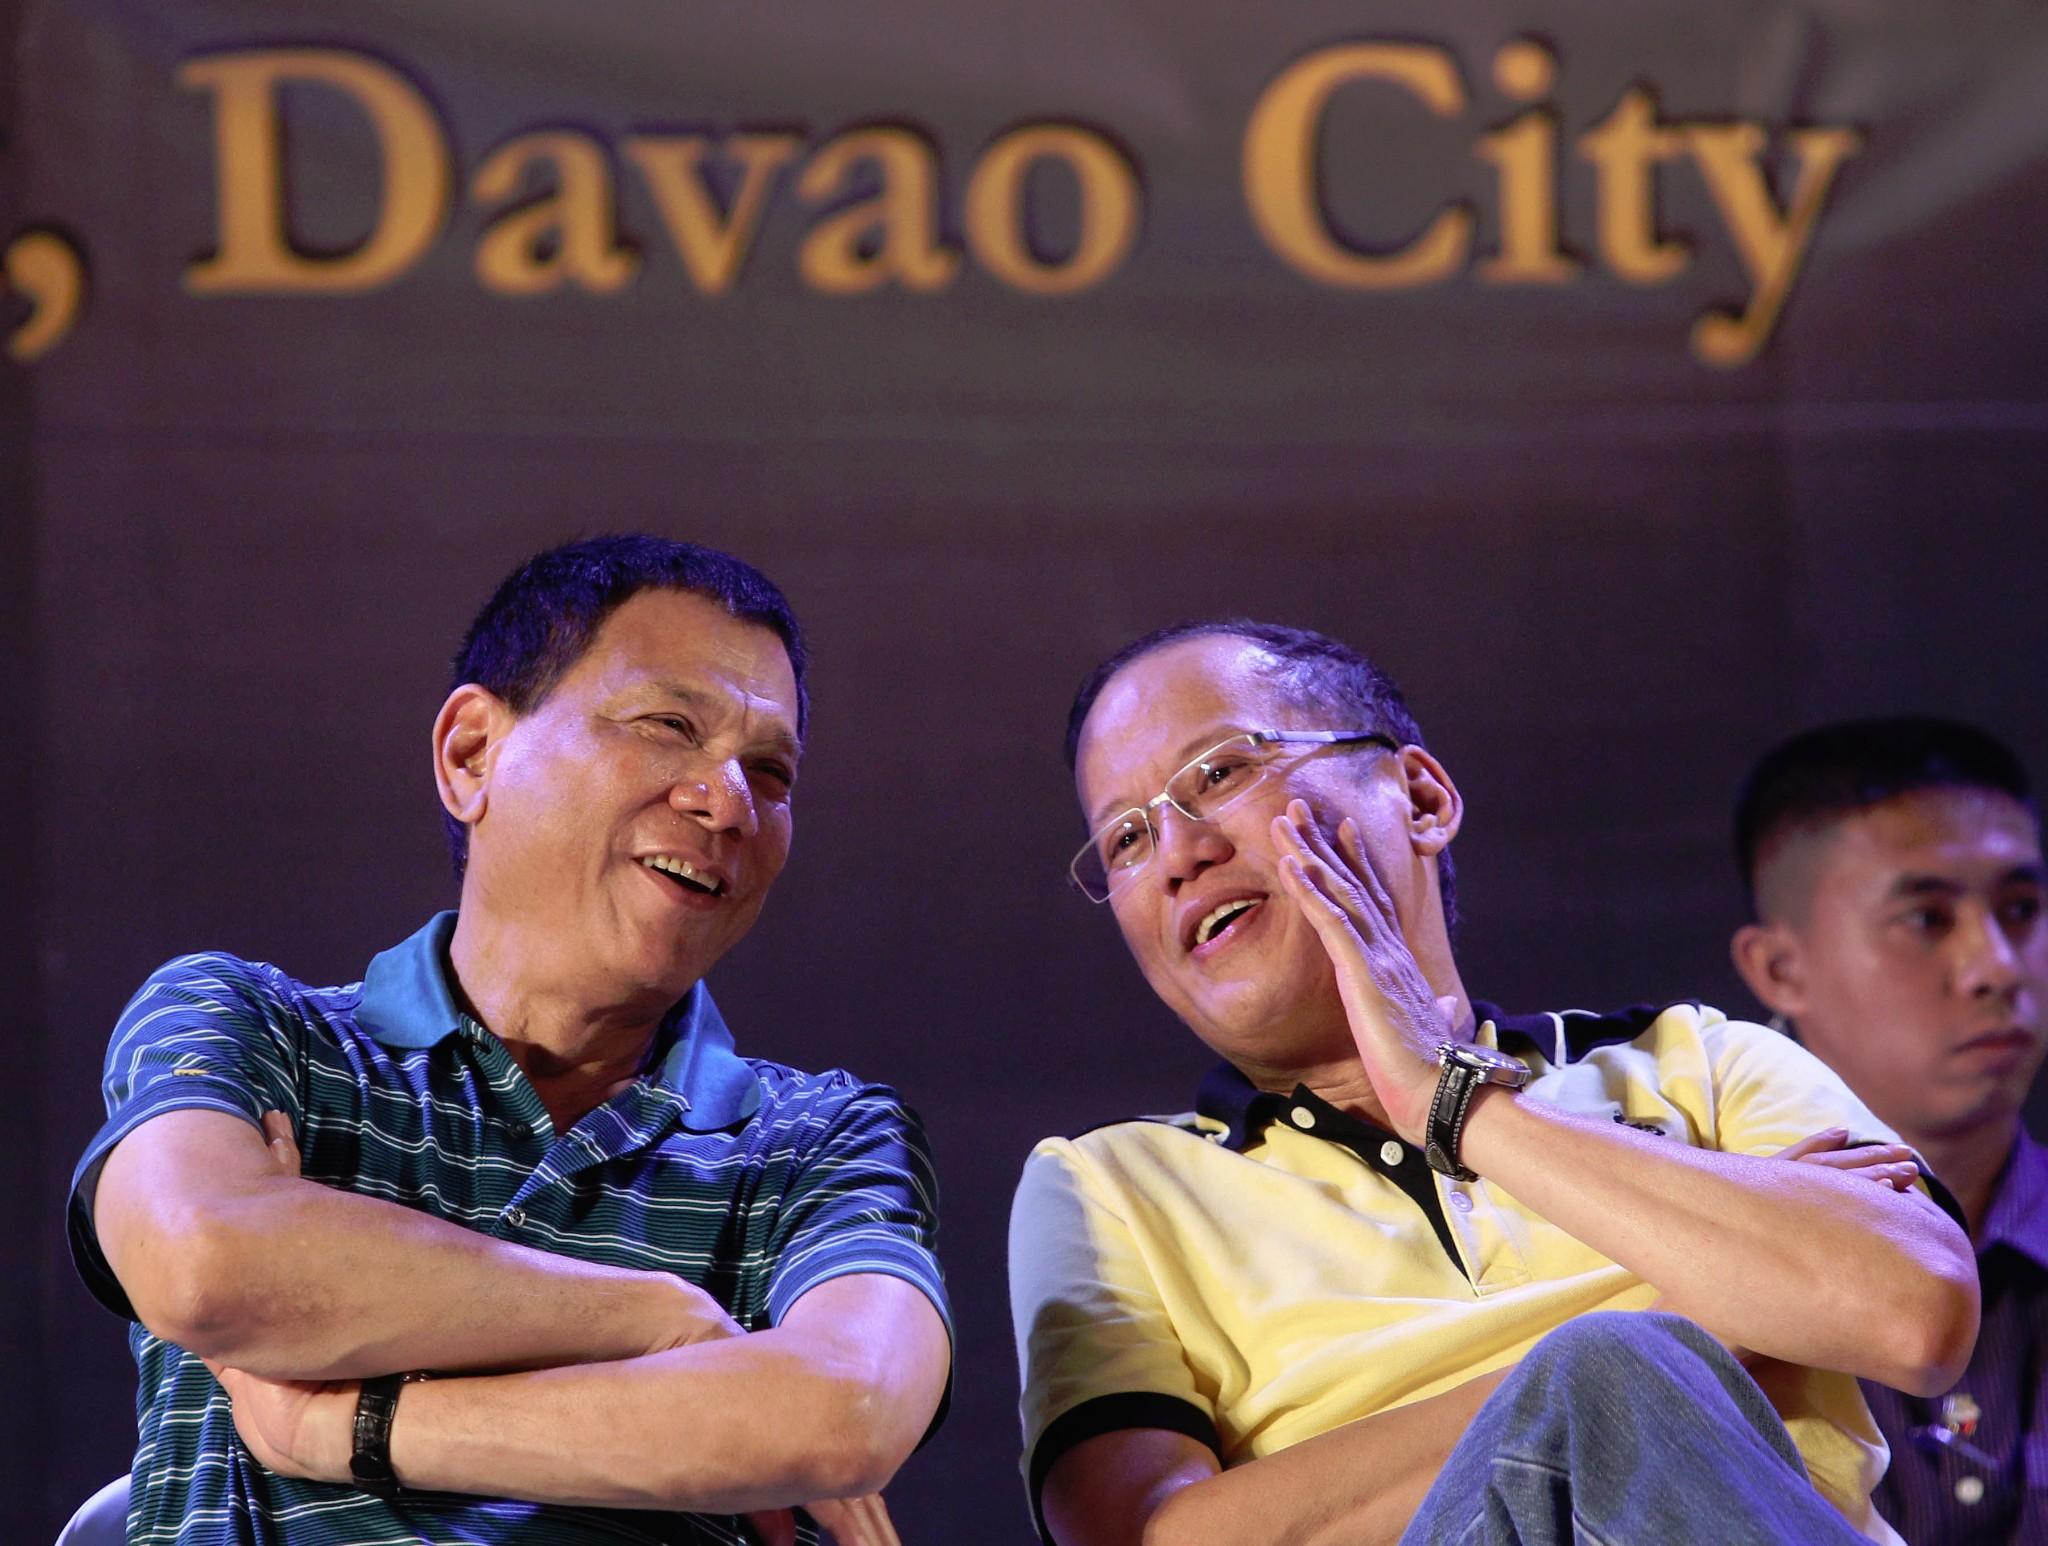 Former Philippine President Benigno S. Aquino III converses with then Davao City Vice Mayor Rodrigo Duterte in 2013.